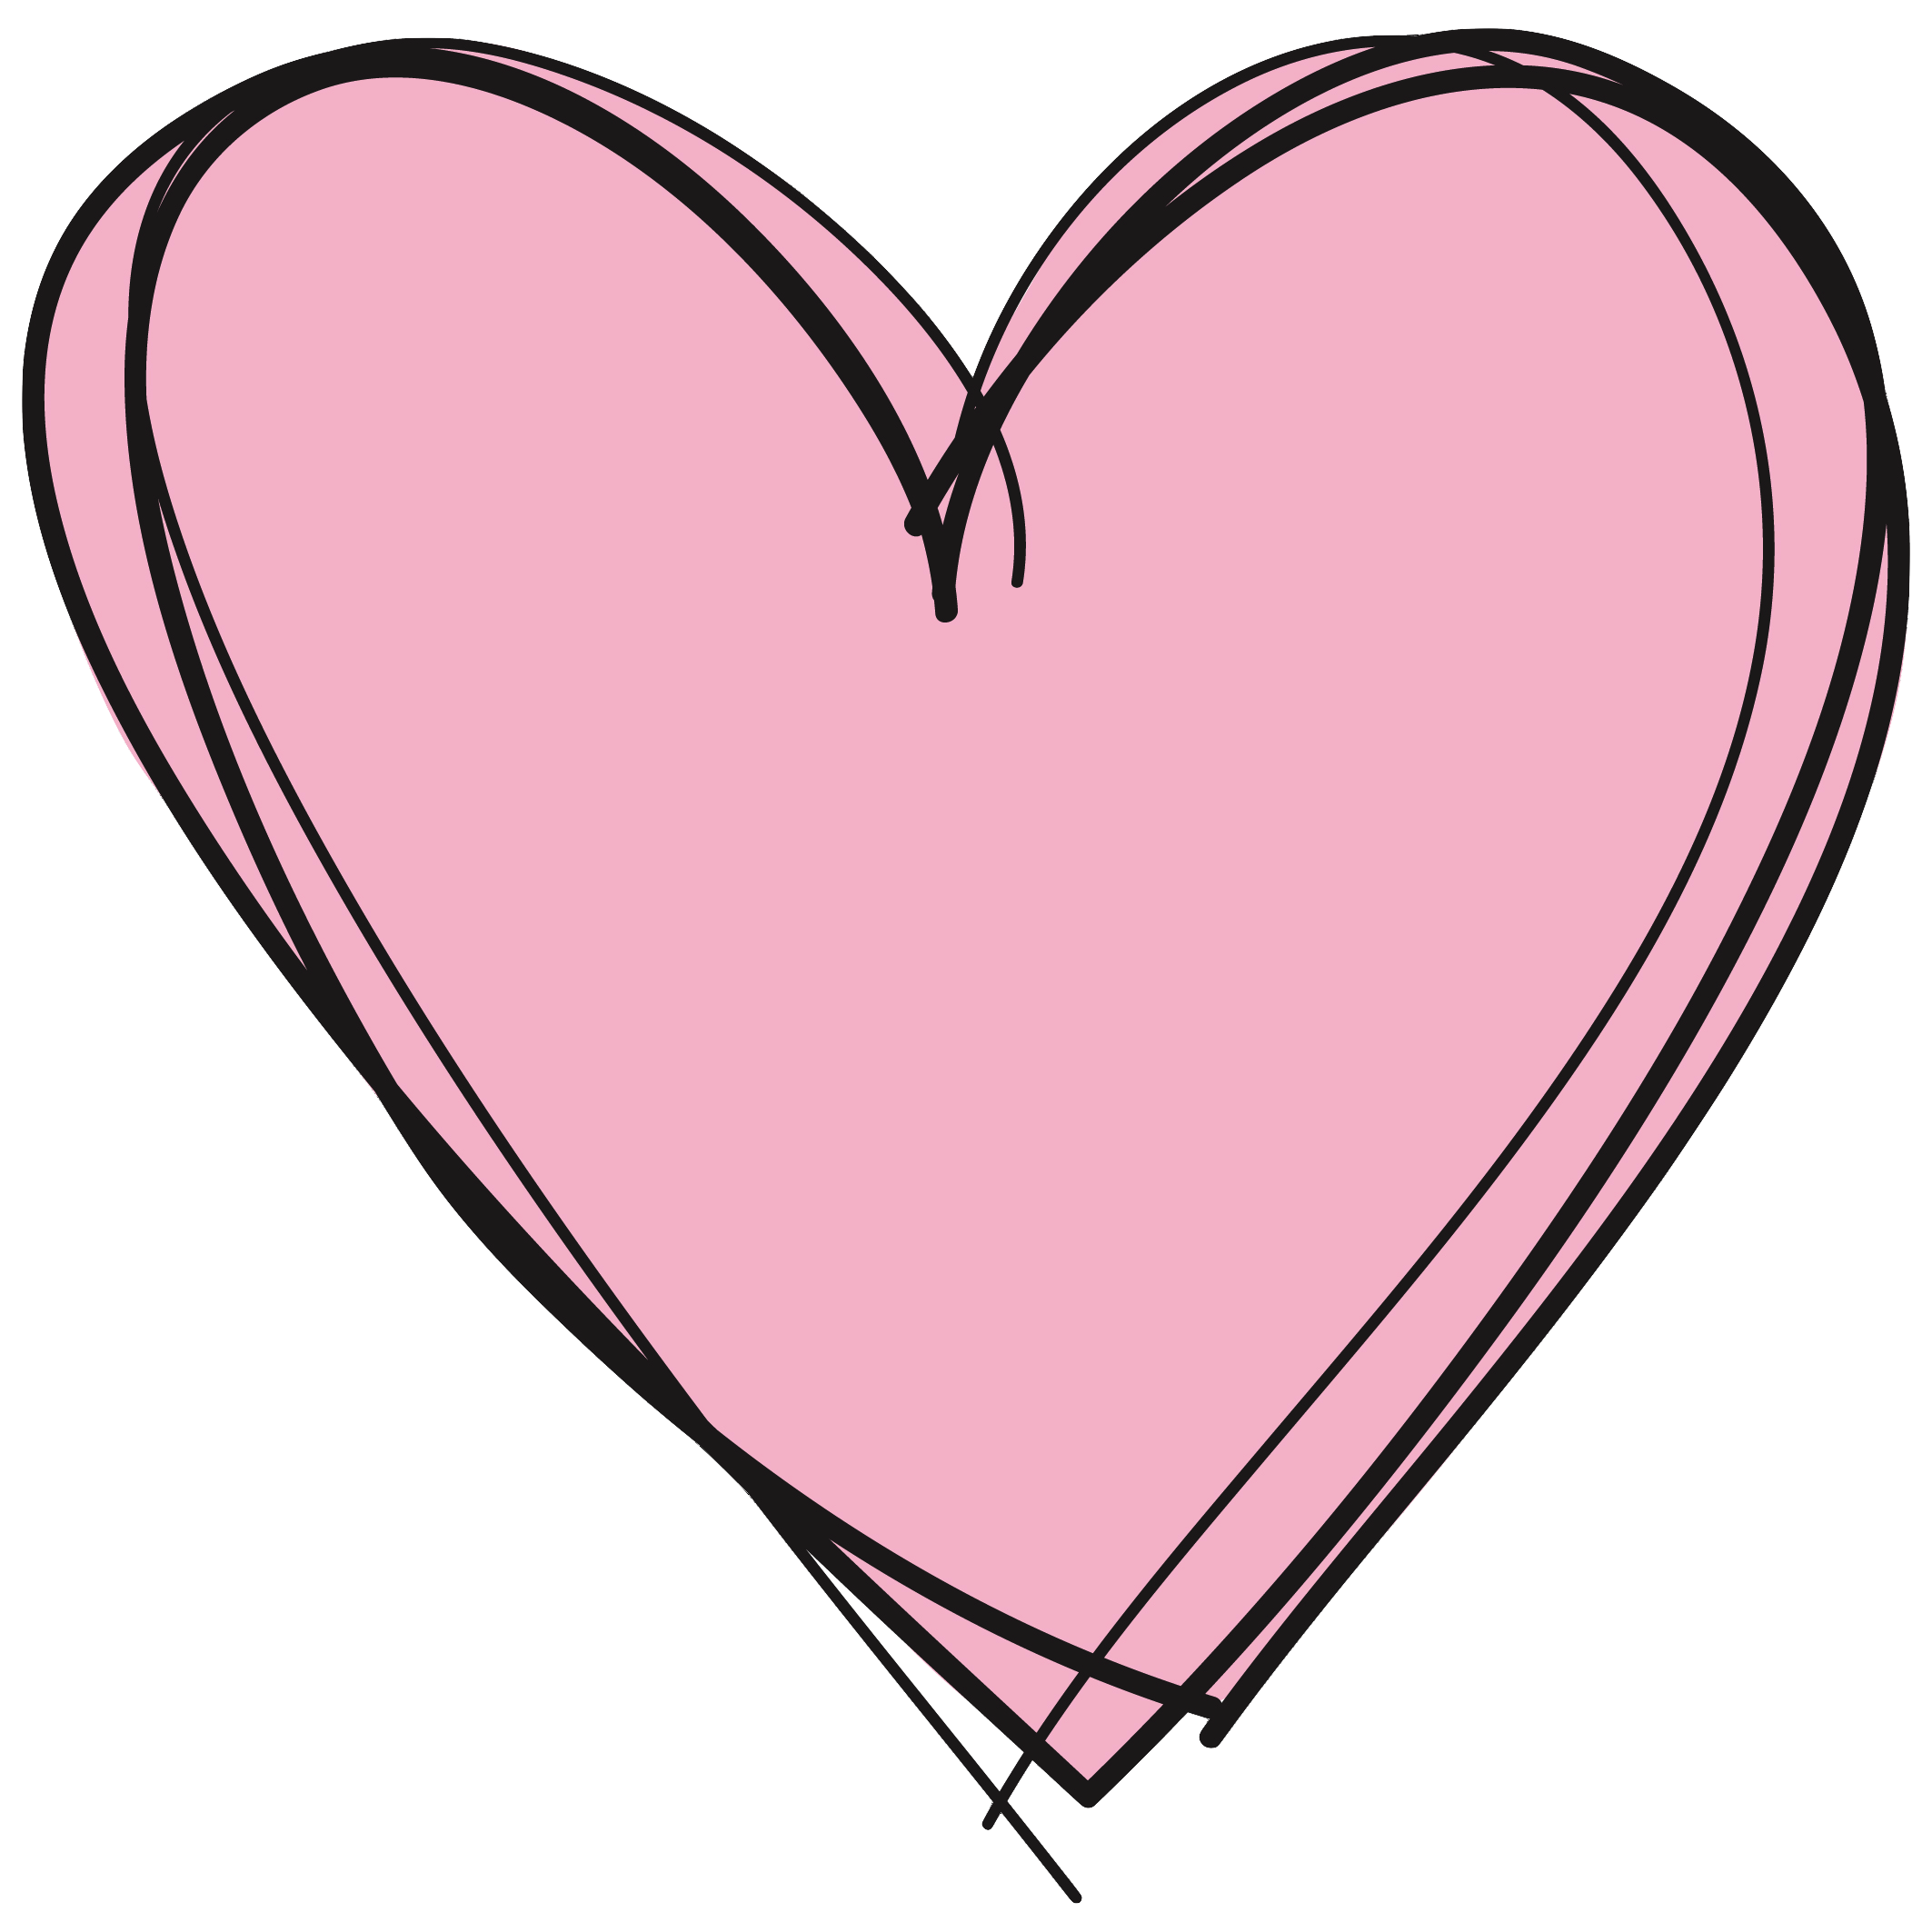 Heart clipart human. Tumblr clipground